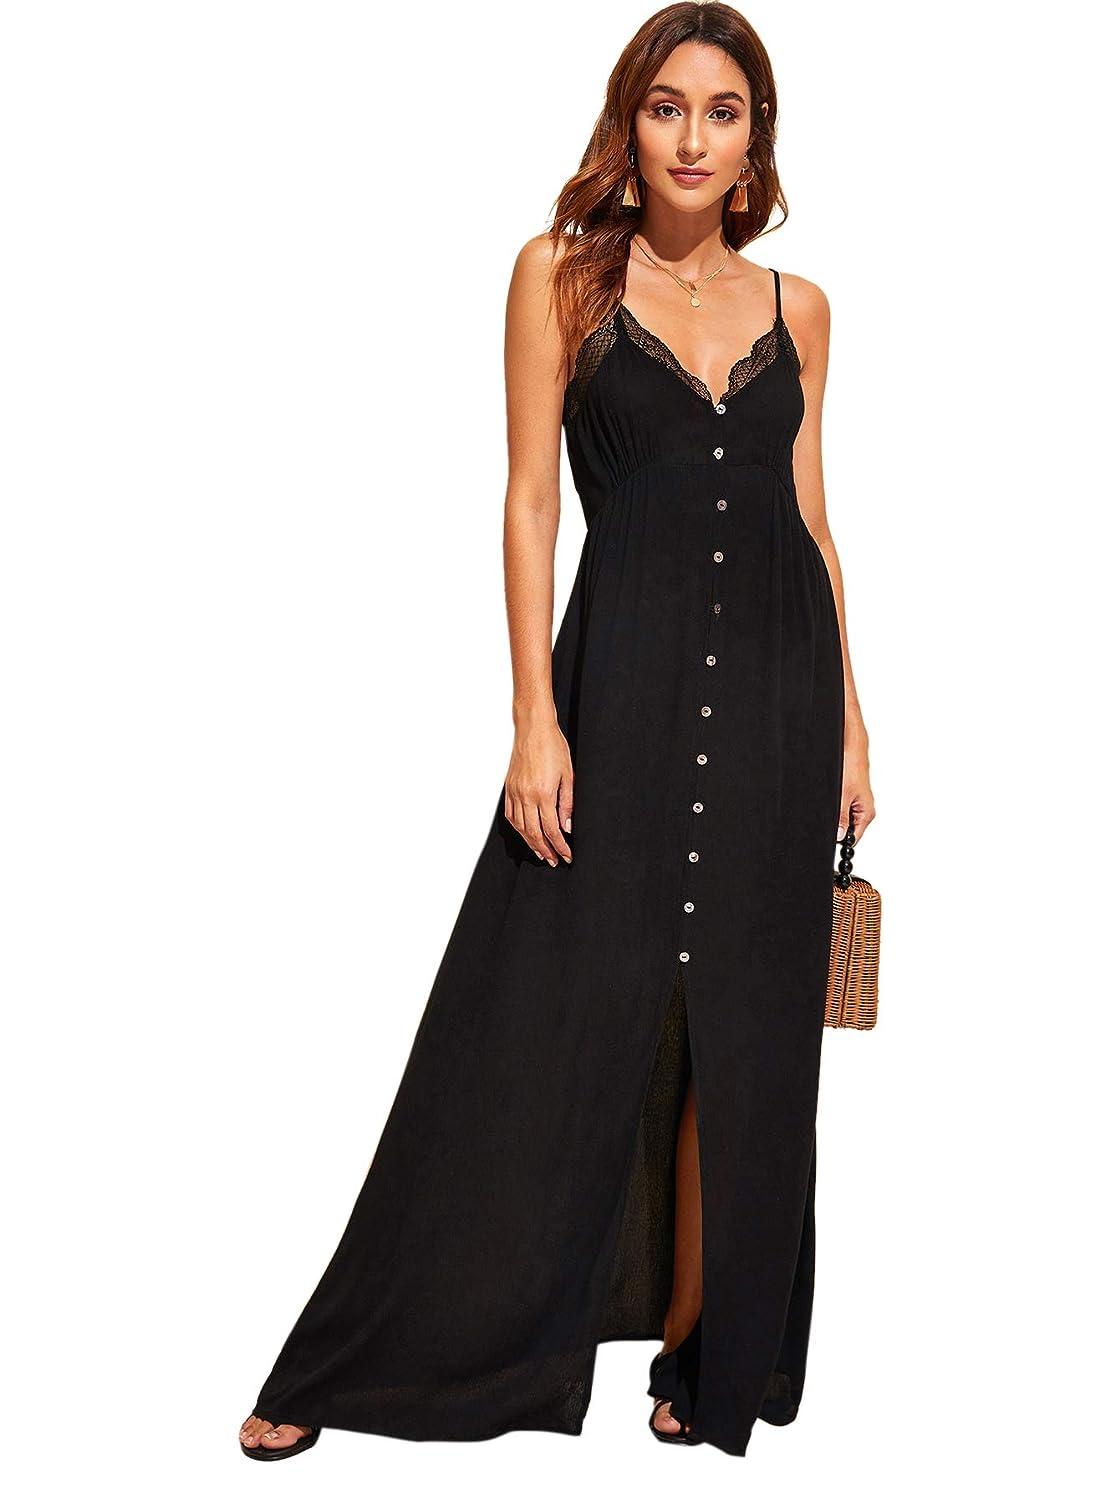 Verdusa Women's Button Front Lace Trim Spaghetti Strap Split Maxi Dress